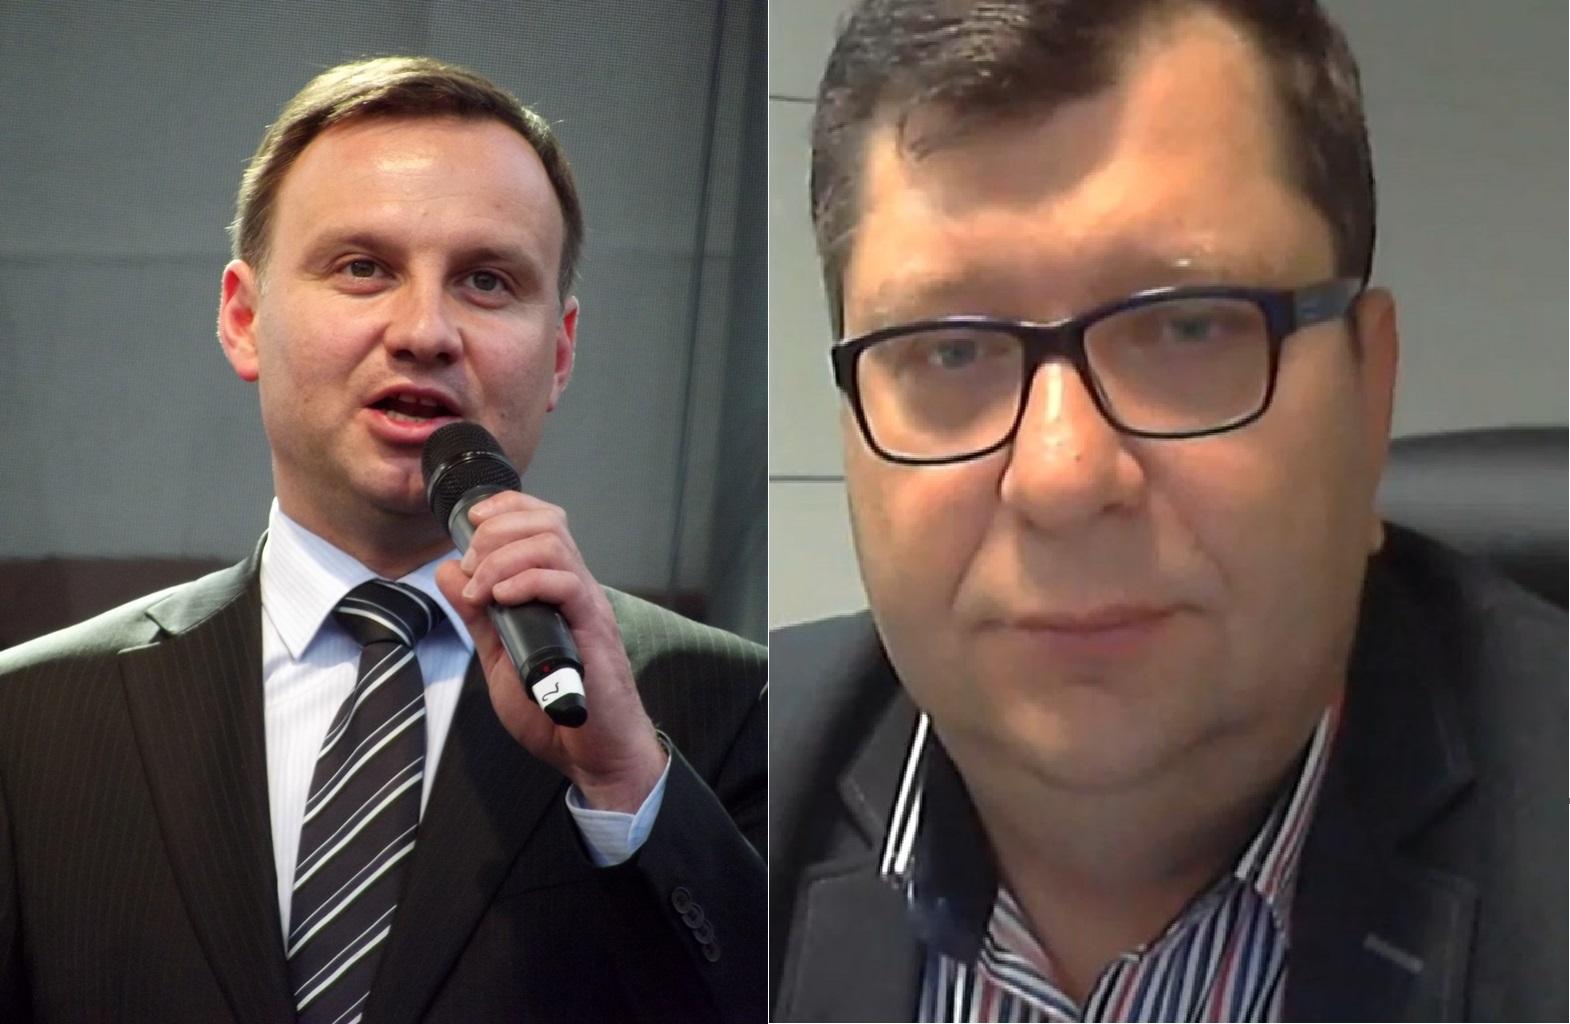 Prokuratura zajmie się słowami Stonogi nt. prezydenta Dudy i prezesa PiS